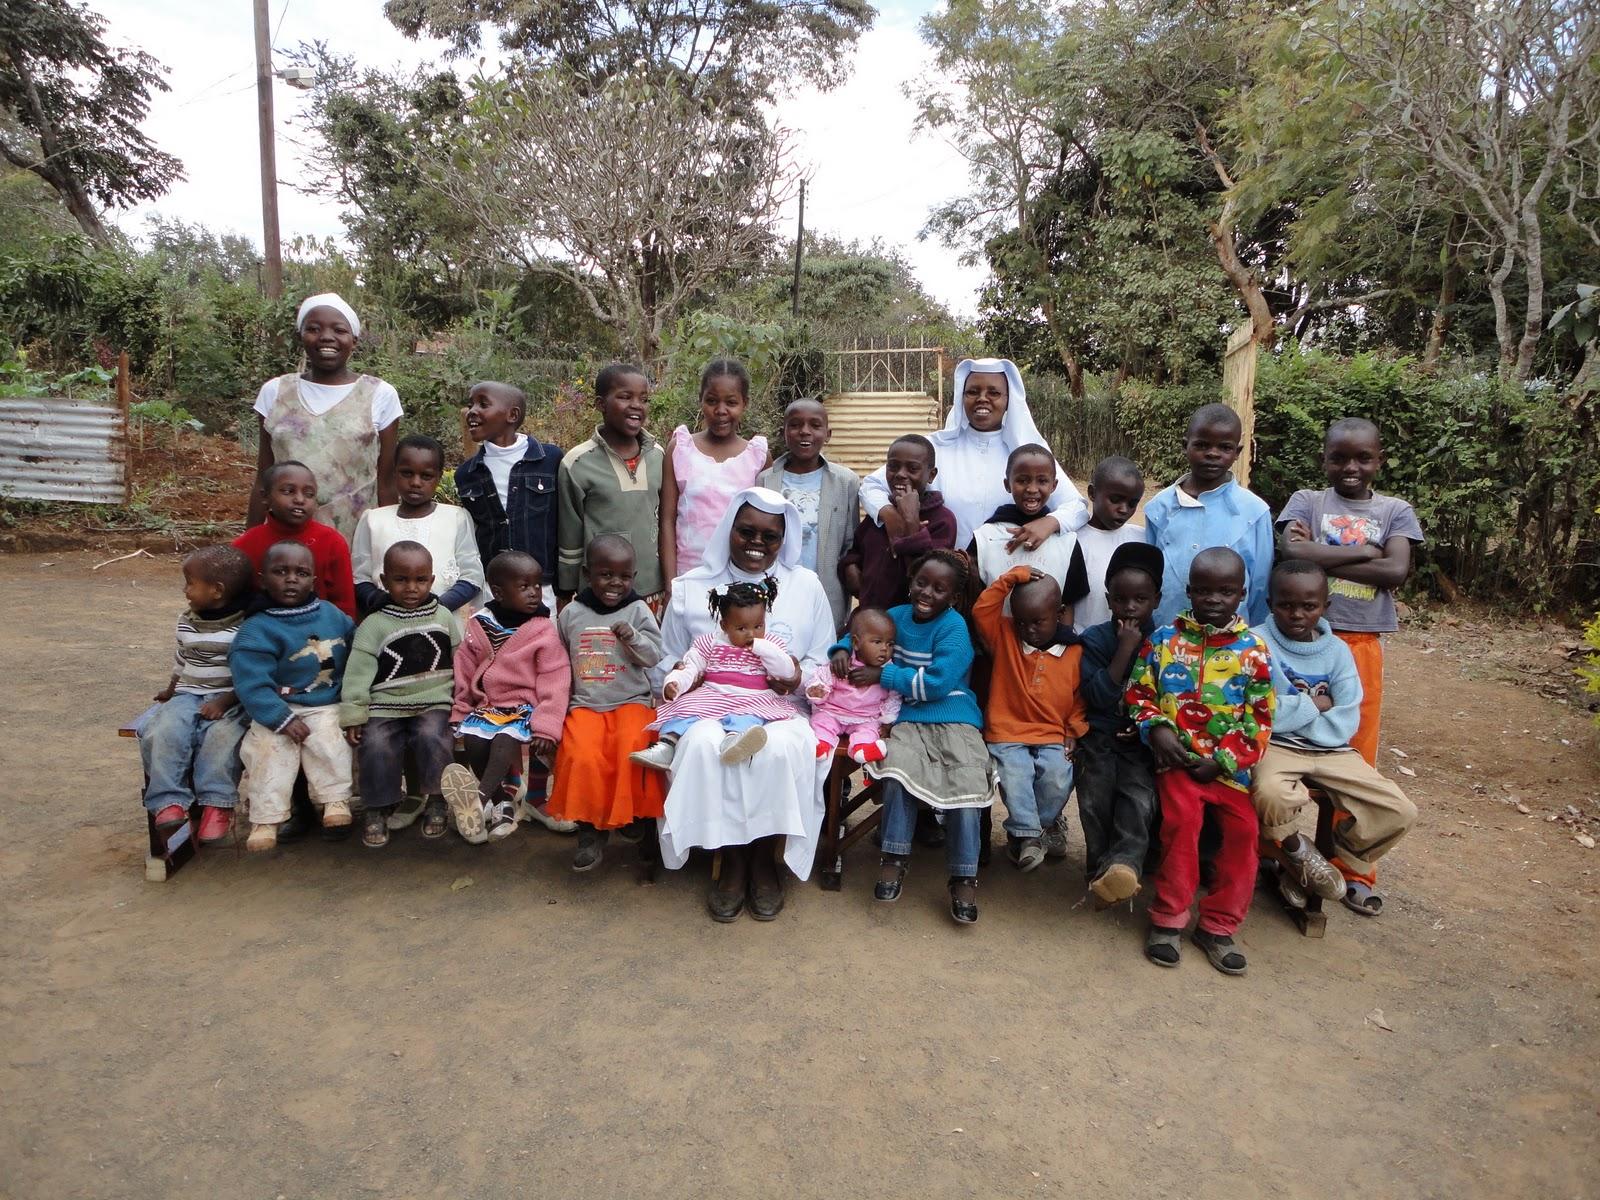 IMH Hospital & Community of Hope Children's Center   Kilimambogo, Kenya